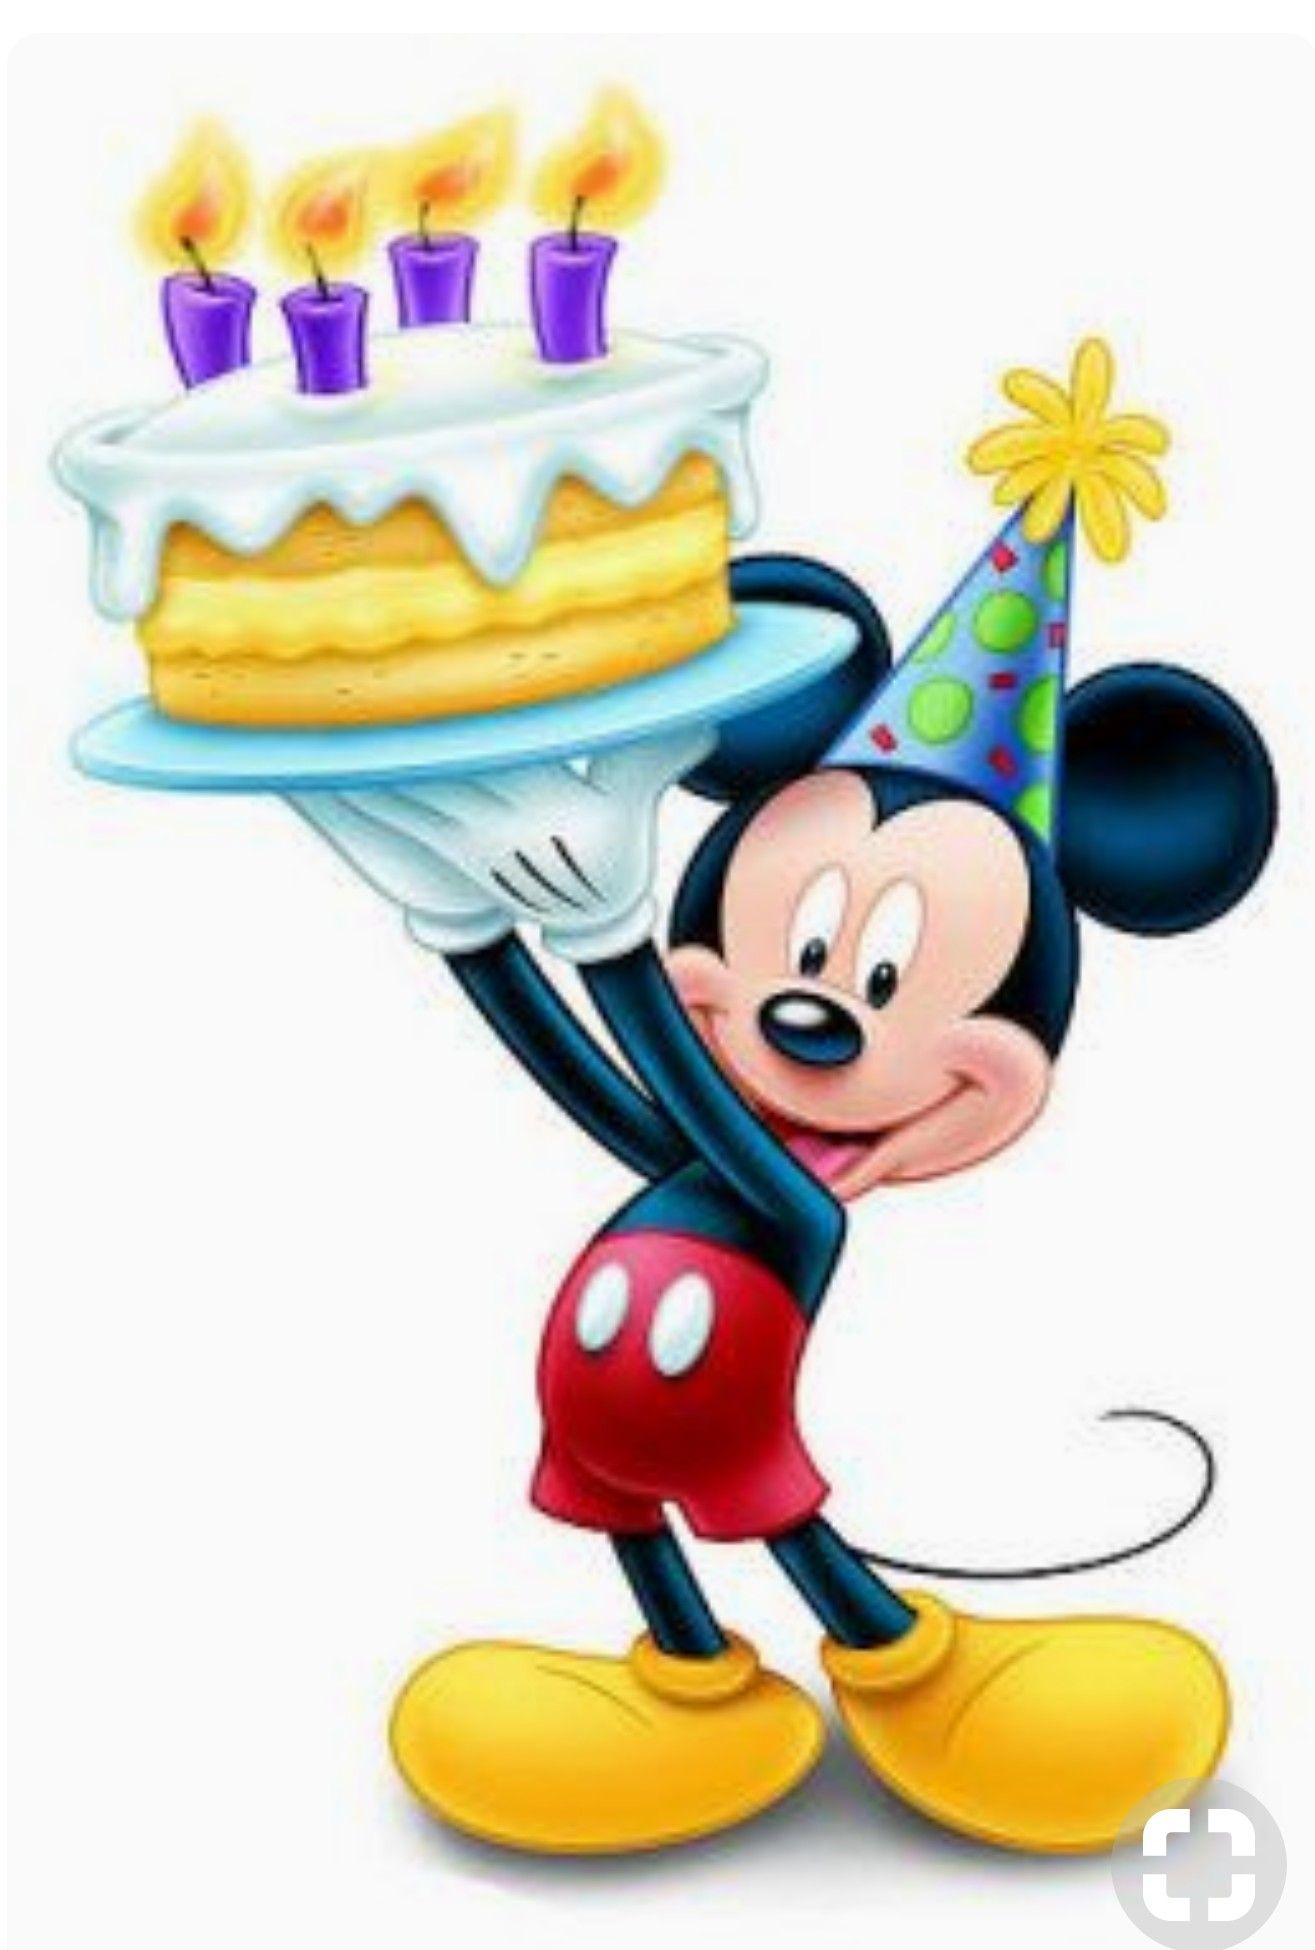 Pin By Siva Sachin On Stuff To Buy Pinterest Birthday Happy